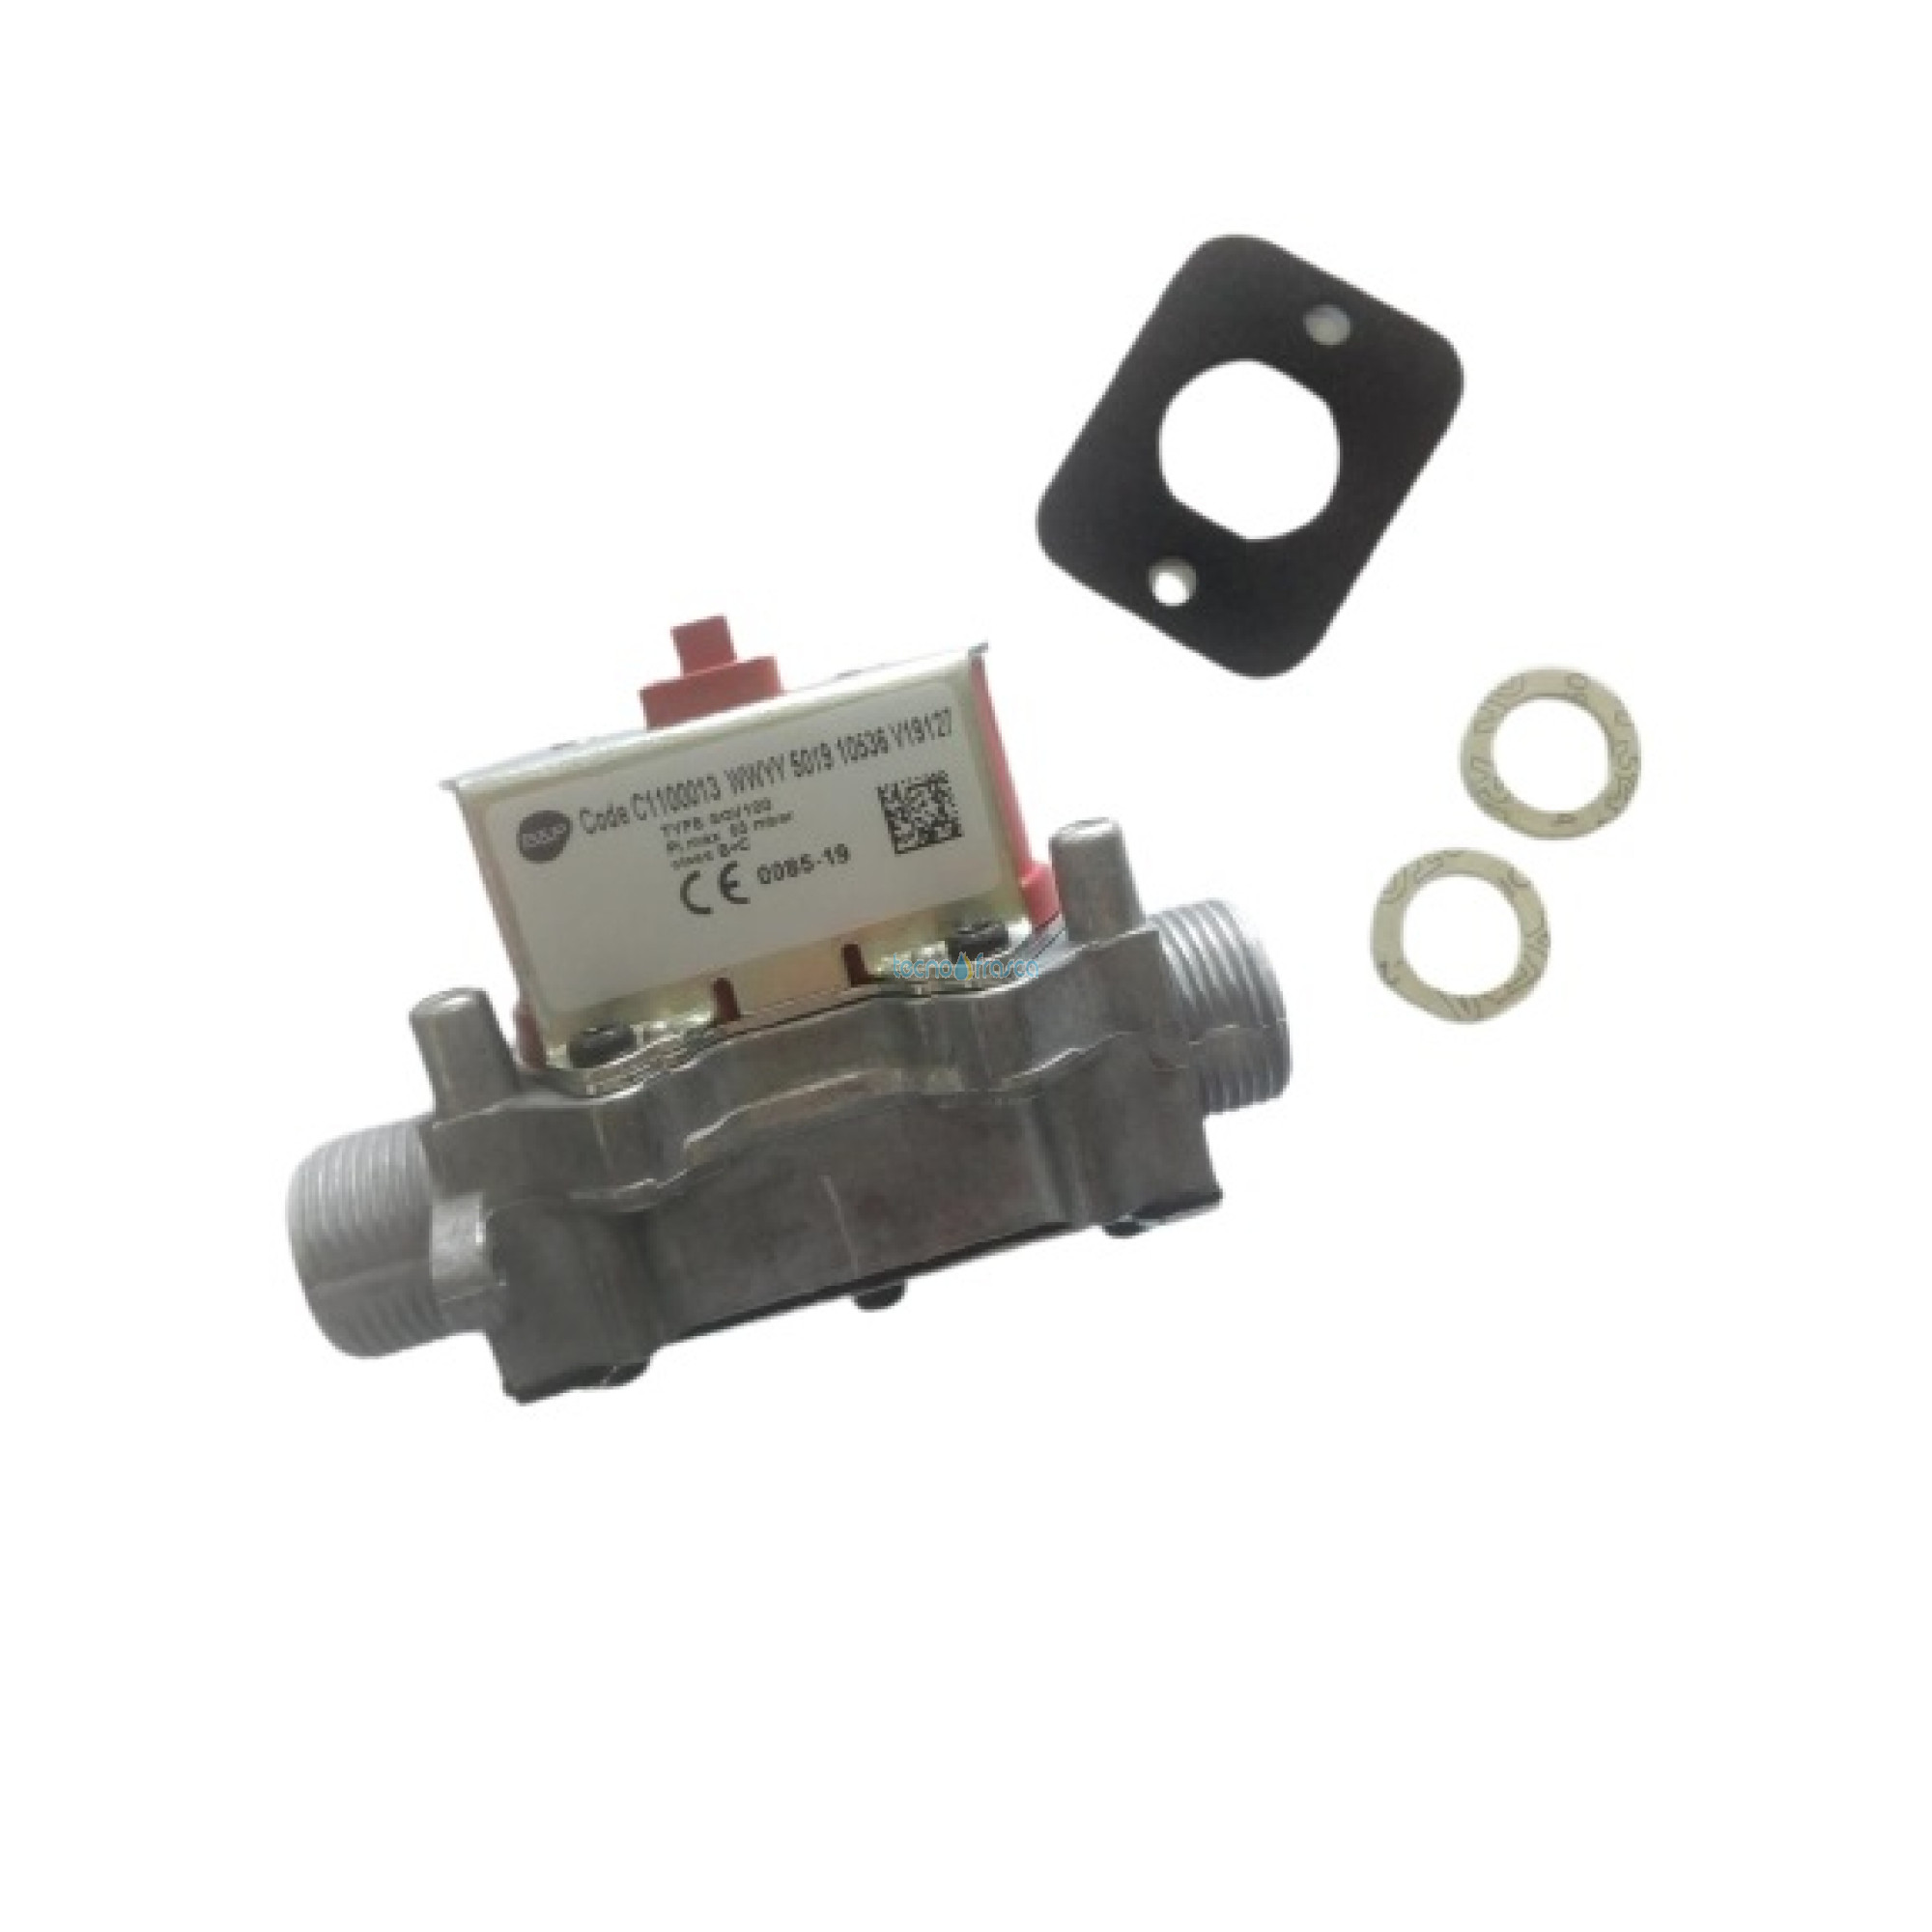 Immergas kit ricambio valvola gas b&p per victrix tt 3.025191